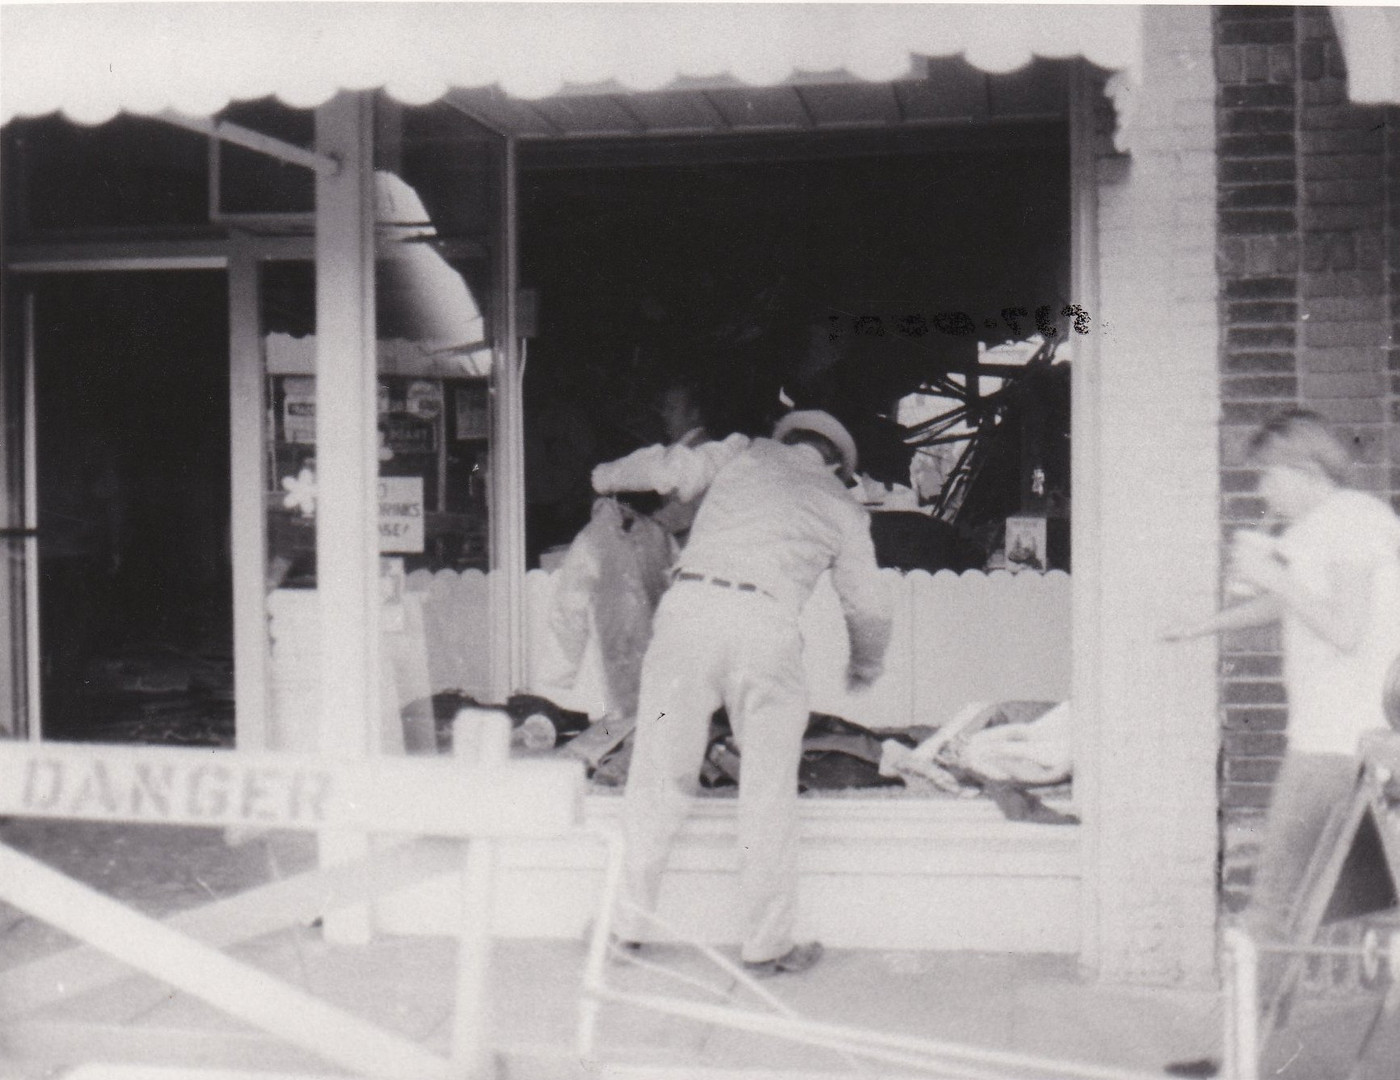 1971 Quake Damage